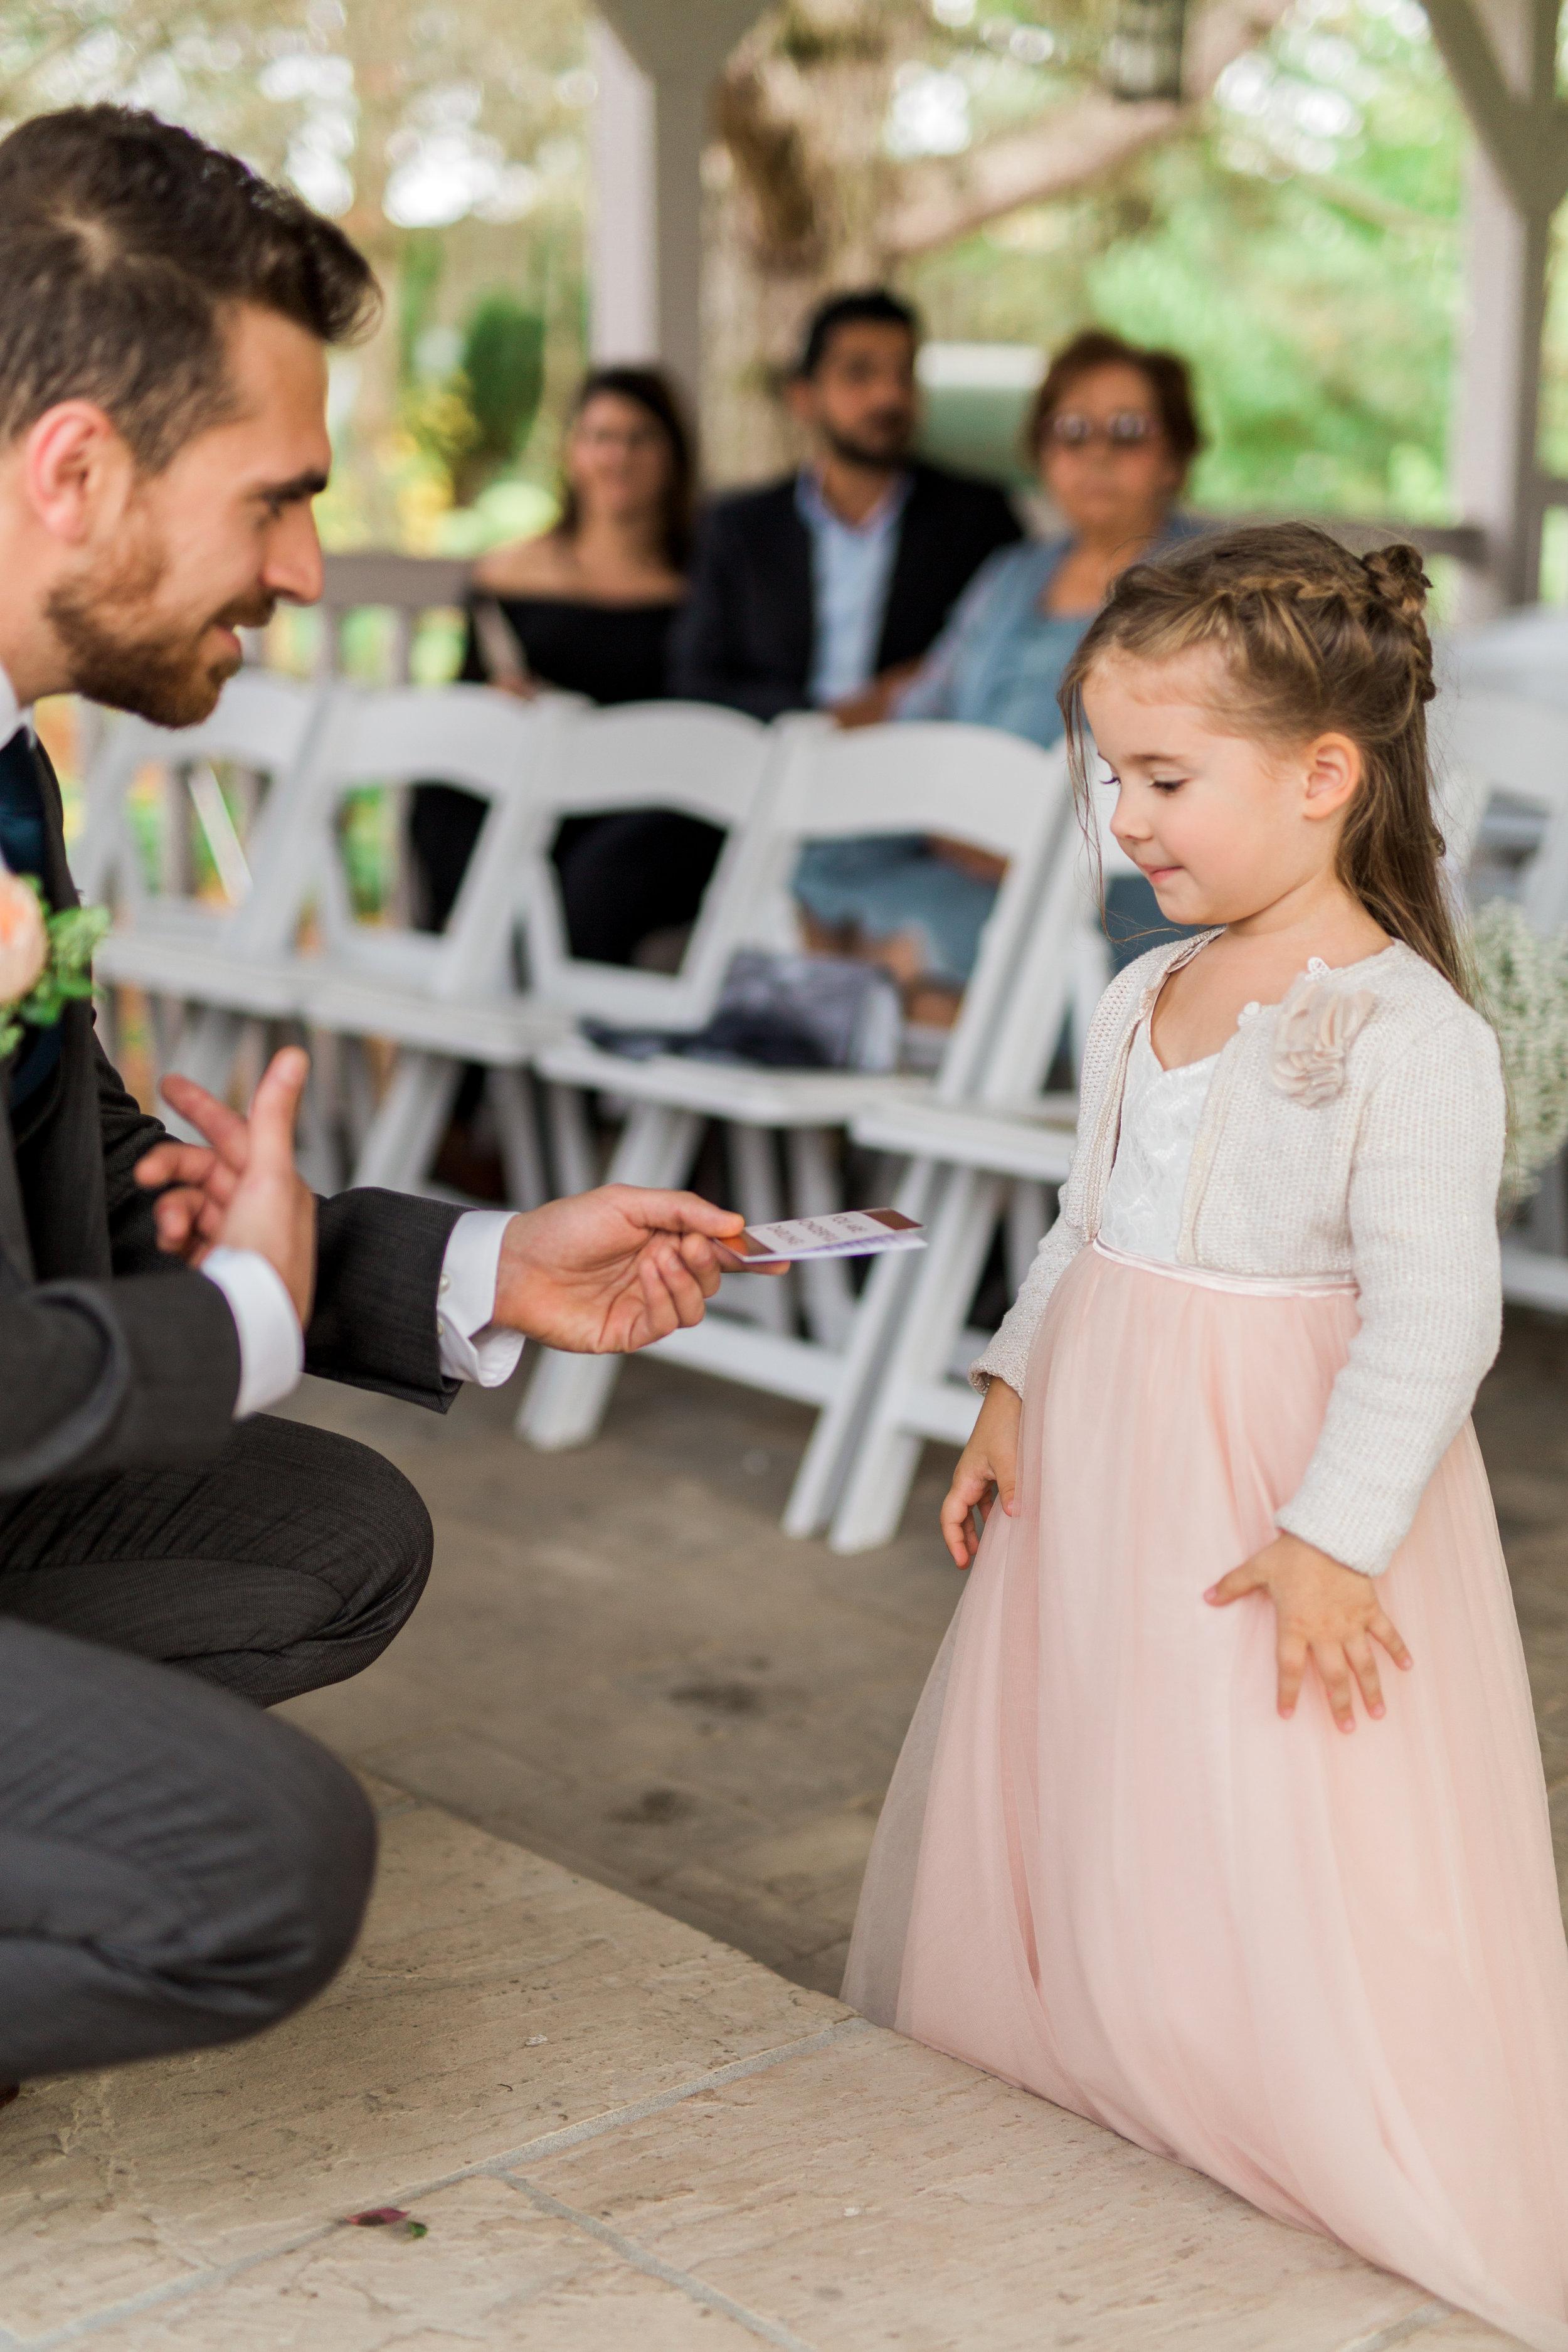 Amir-Golbazi-Danielle-Giroux-Photography_Toronto-Wedding_Cedarwood_Rachel-Paul_129.jpg